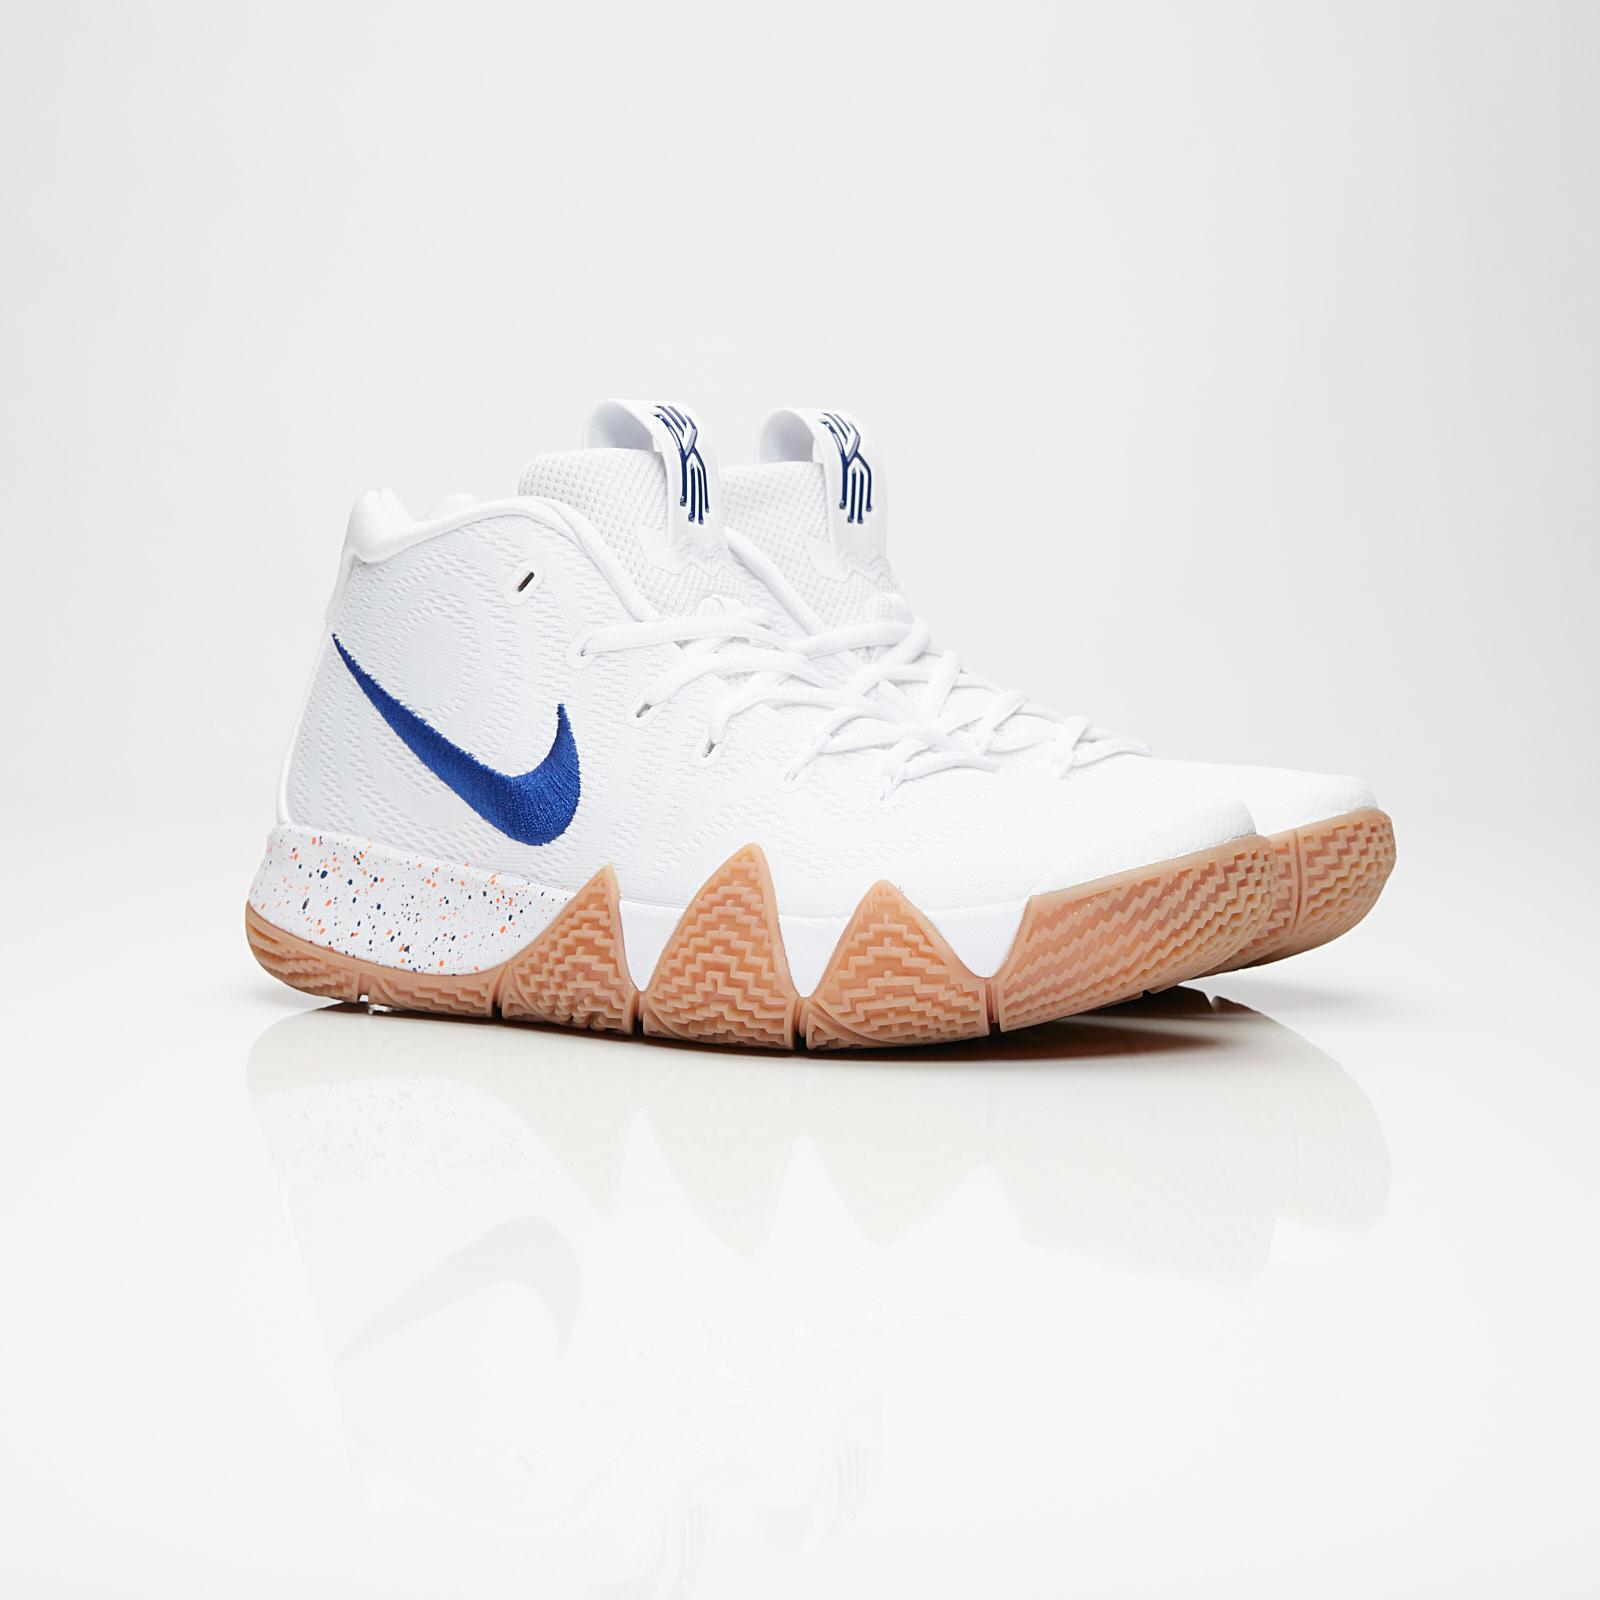 b2a03ef56cb1 Nike Kyrie 4 - 943806-100 - Sneakersnstuff